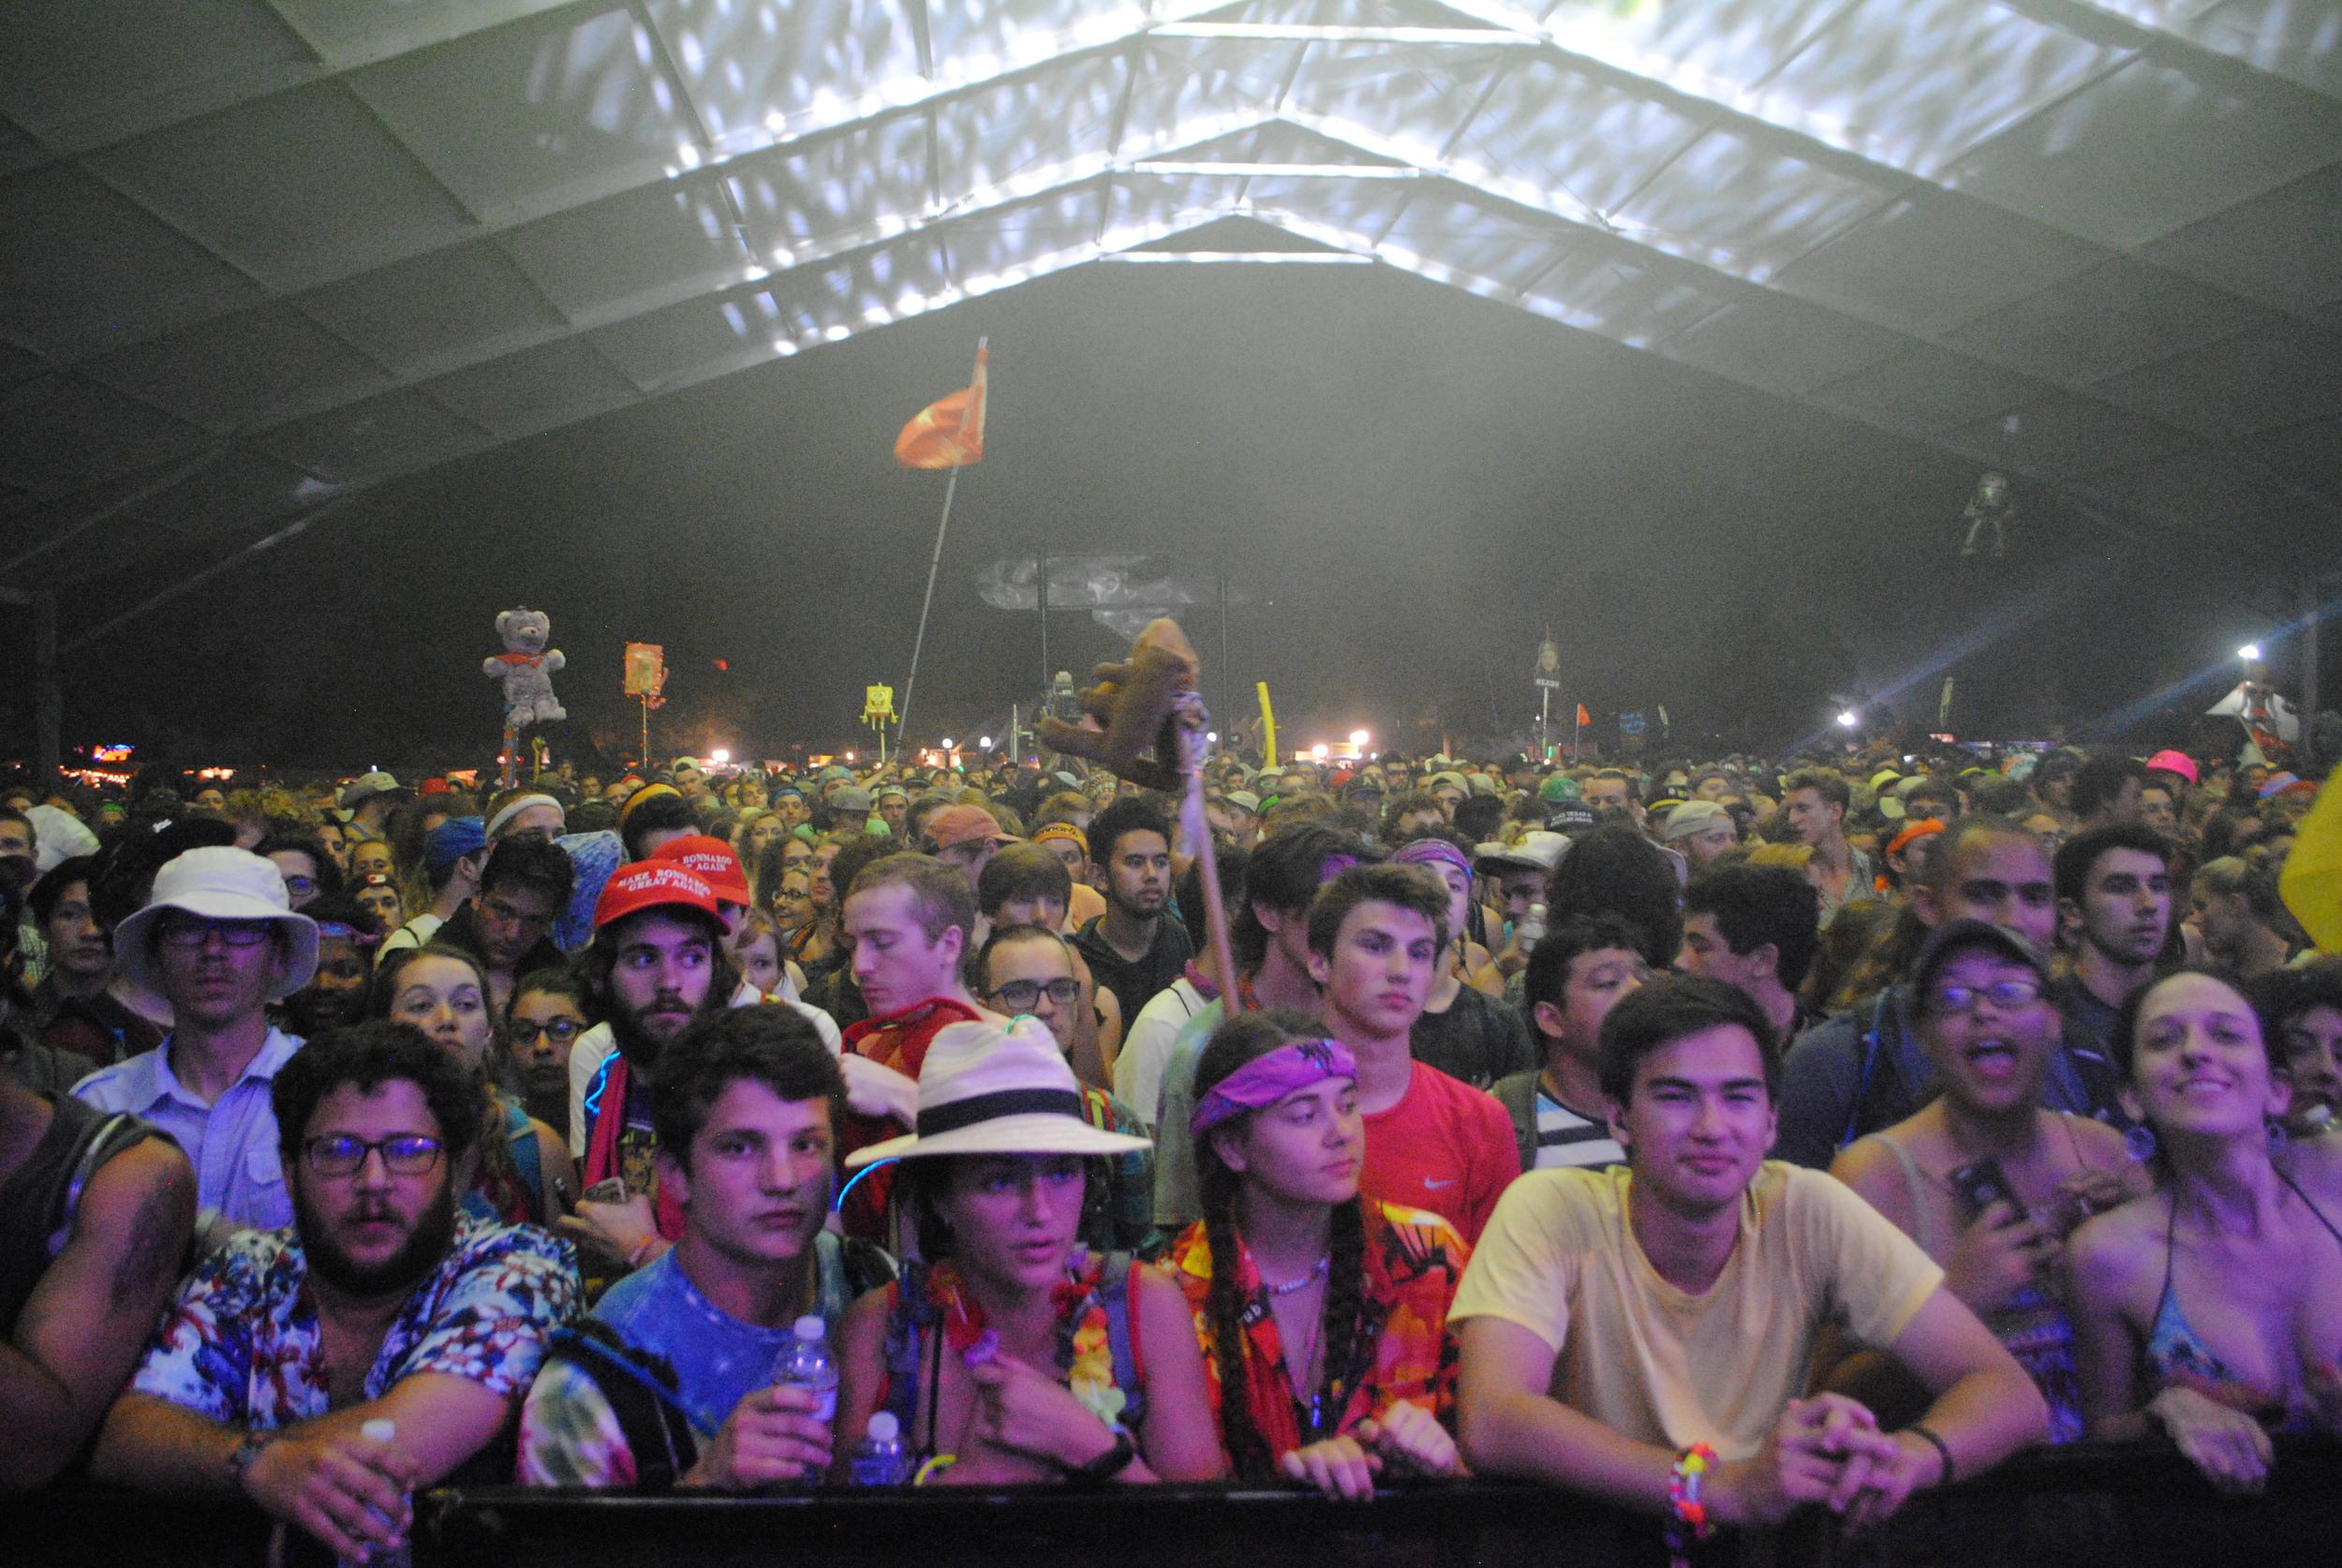 jam crowd.JPG